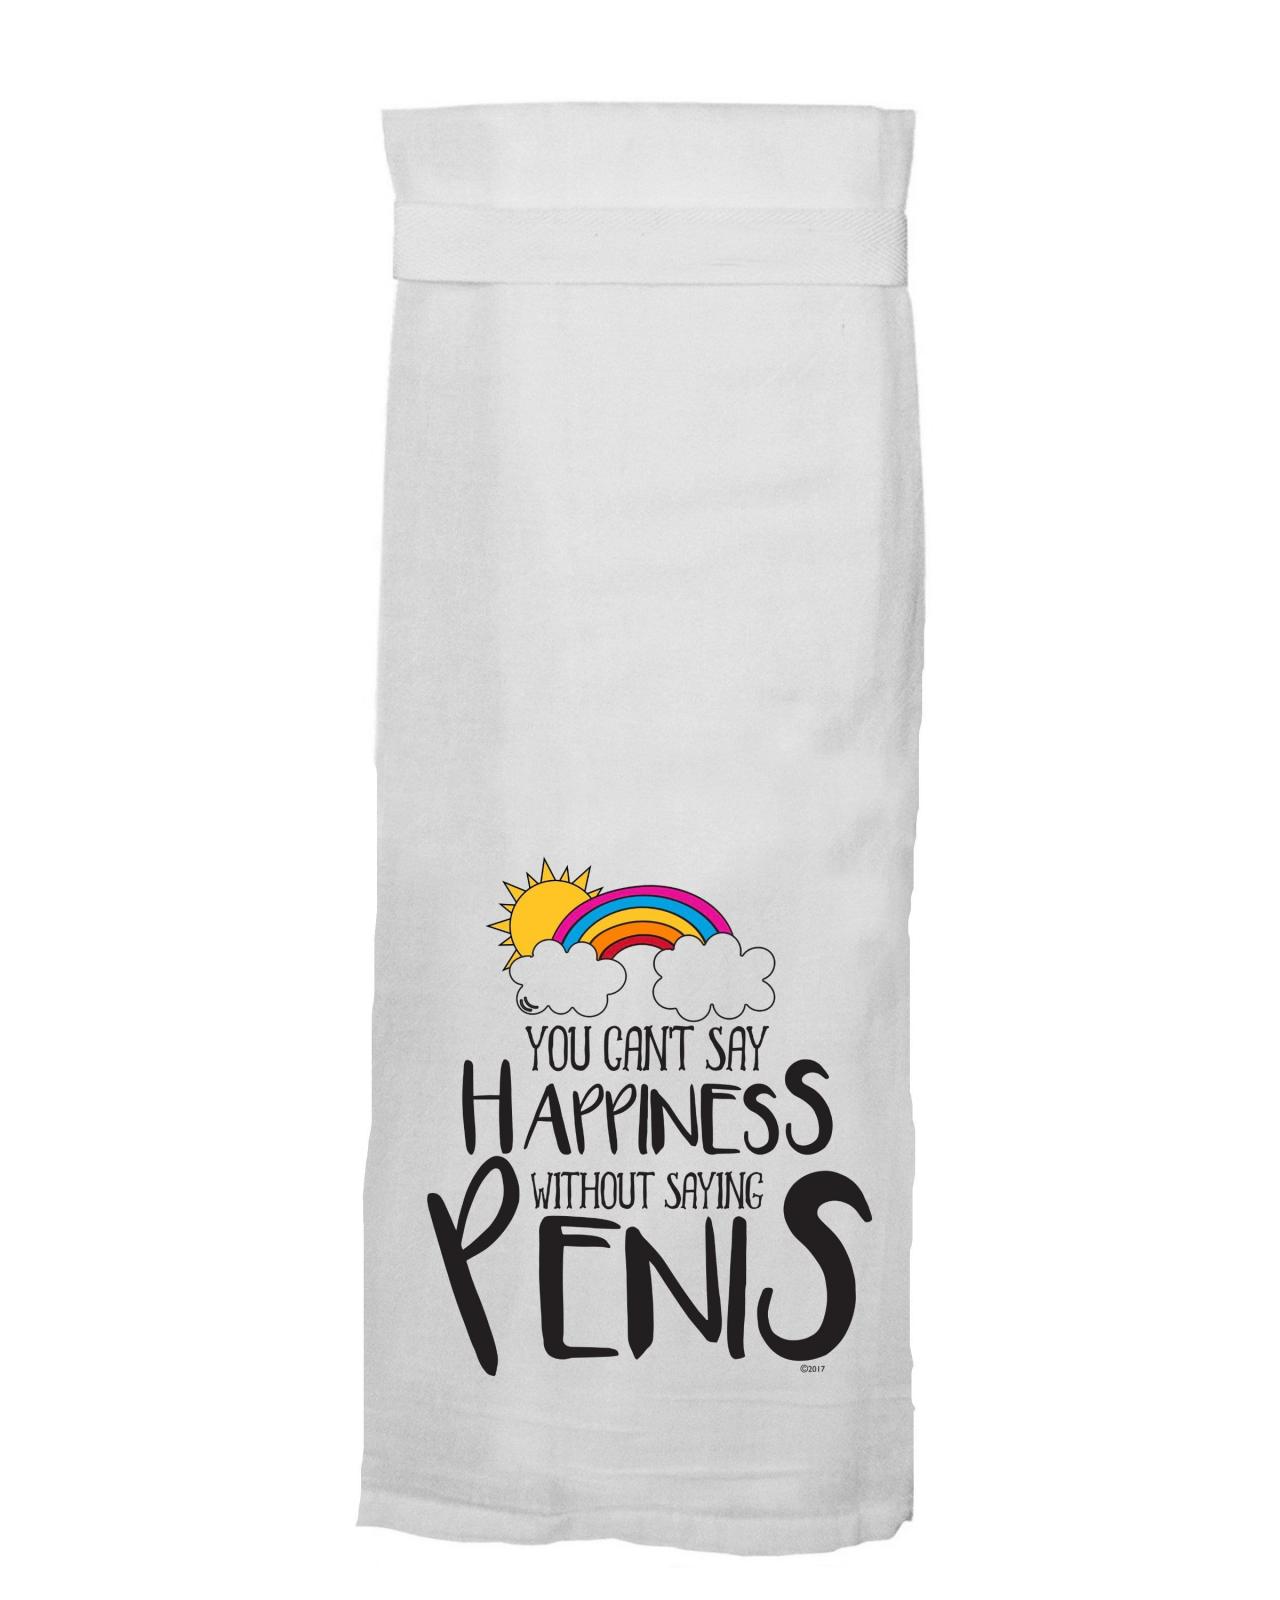 Flour Sack Towel - You Can't Say